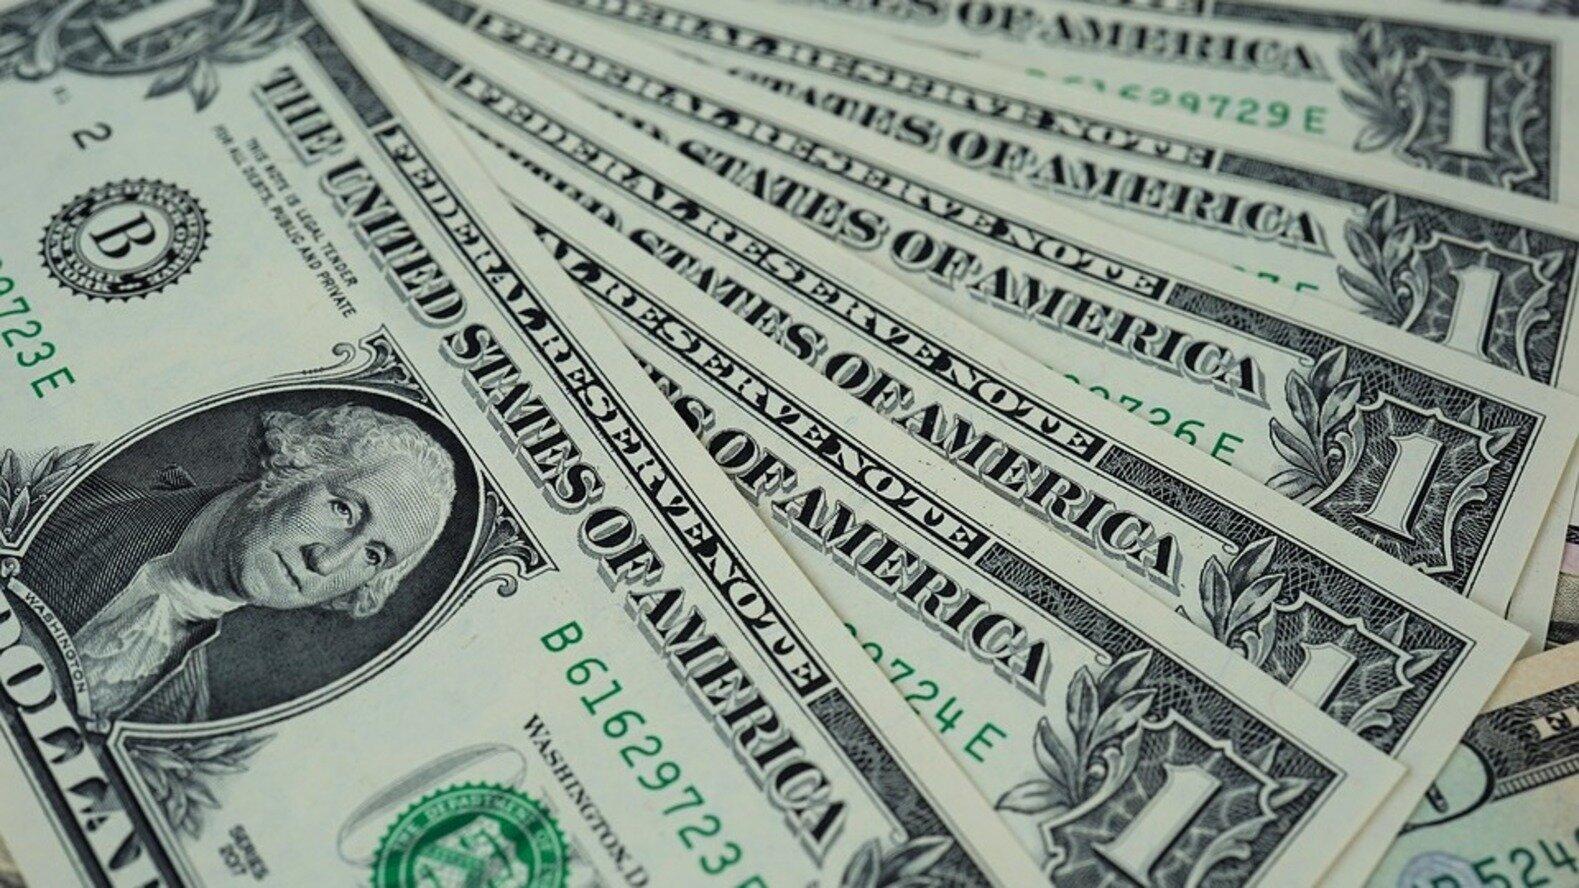 Dapper Labs是Flow,NBA Top Shot和CryptoKitties背后的公司,筹集了3.05亿美元